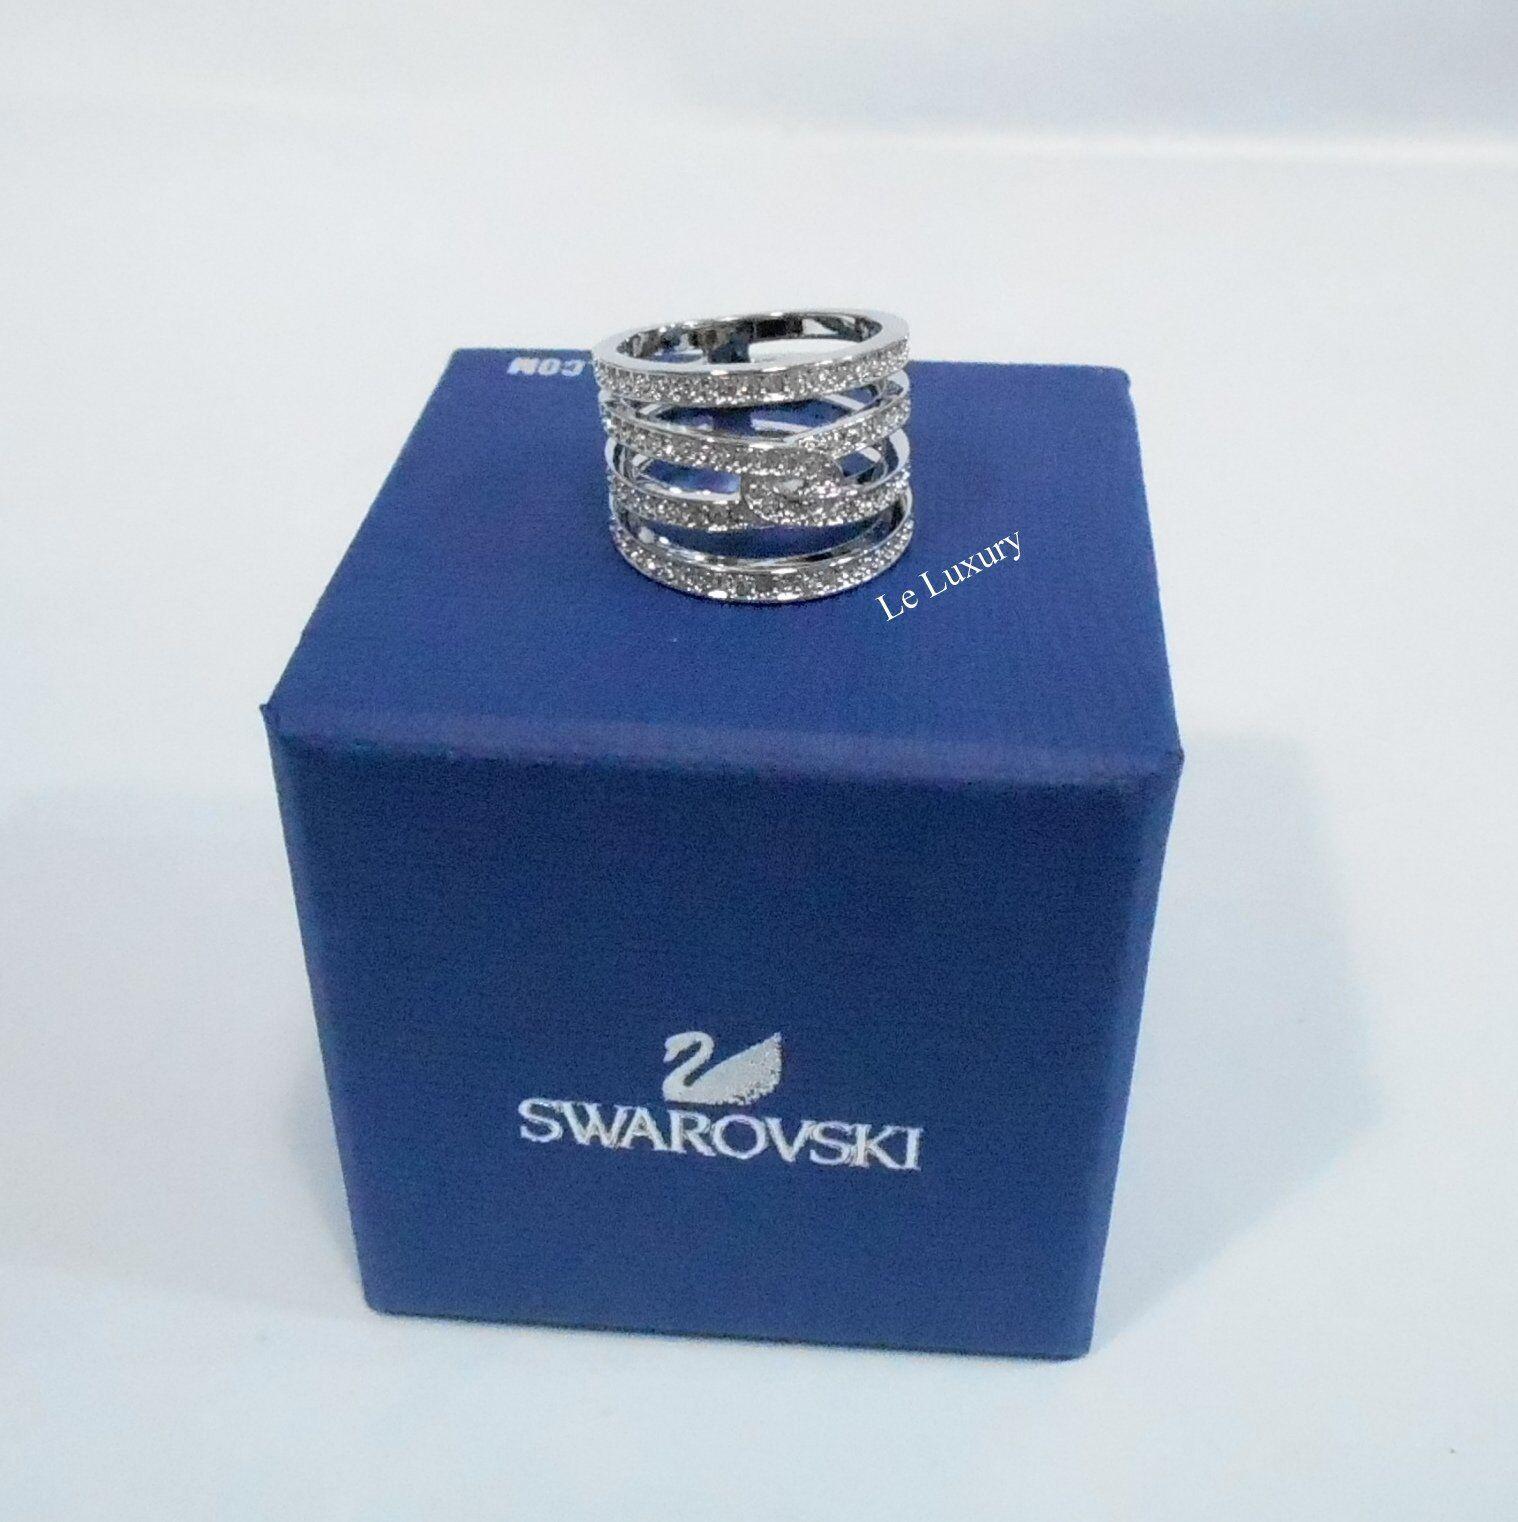 Swarovski Creativity Ring Size S 52 Rhodium-plated Clear crystal MIB 5139652